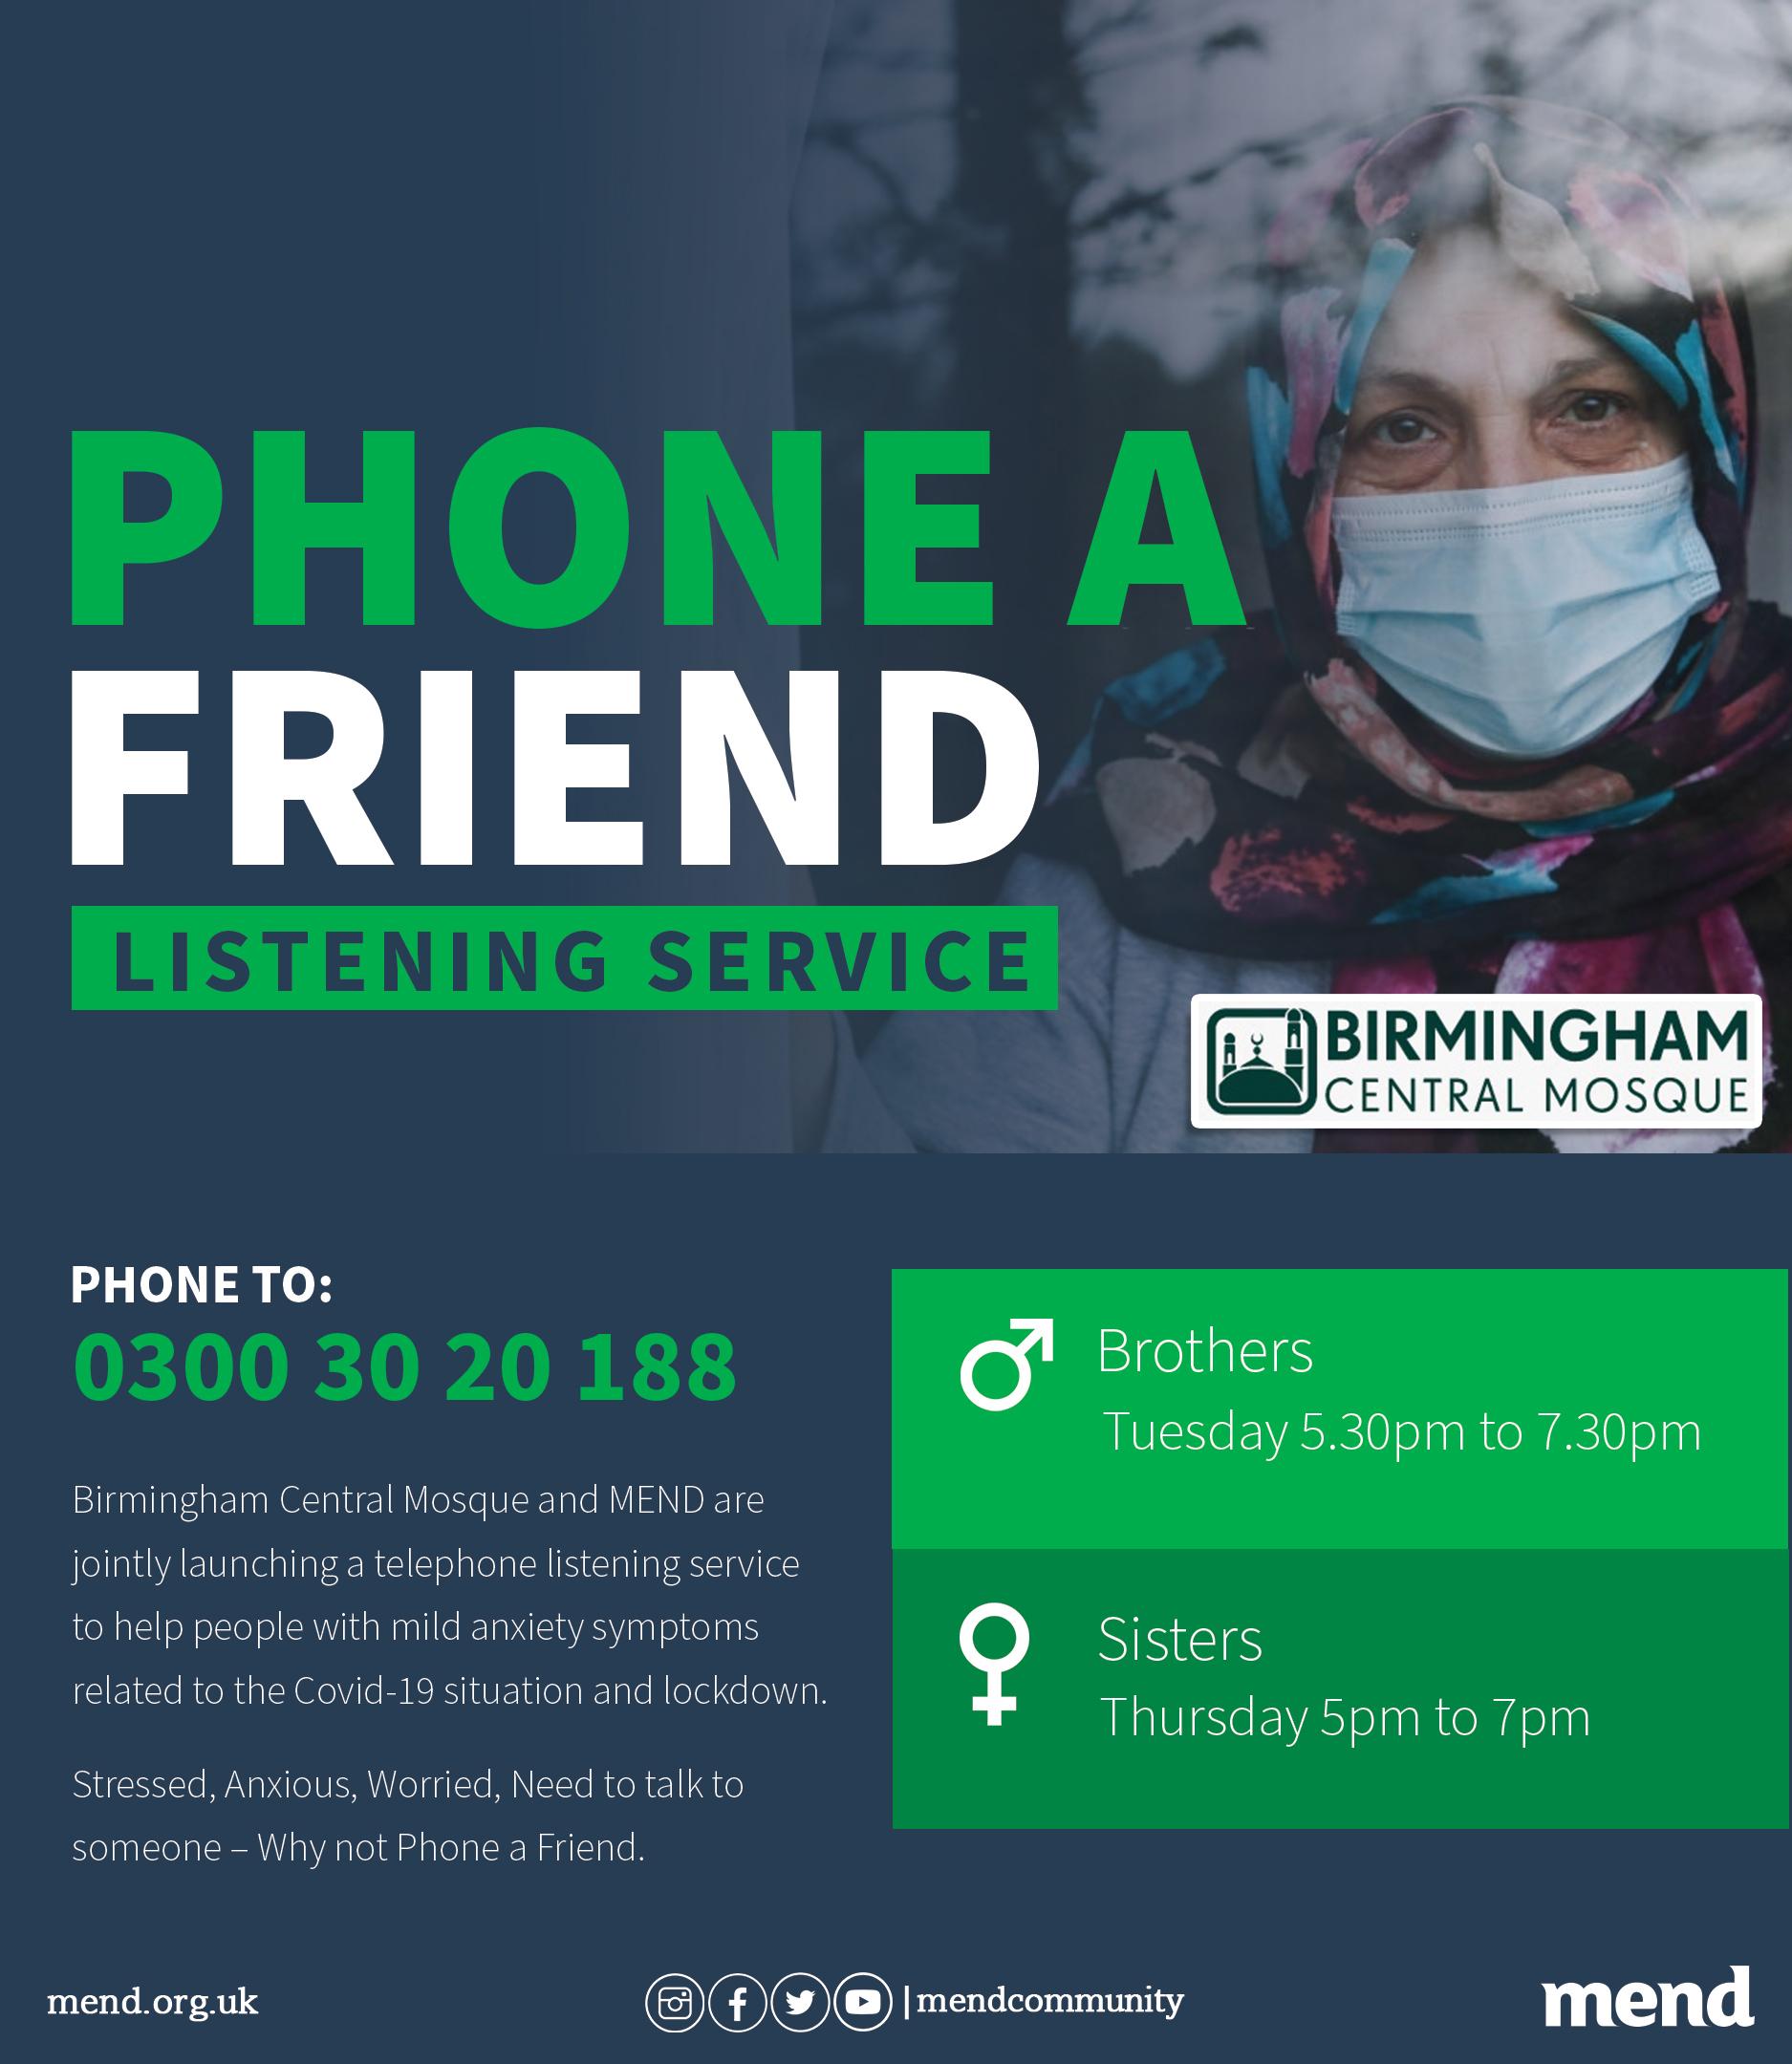 Phone a Friend Listening Service